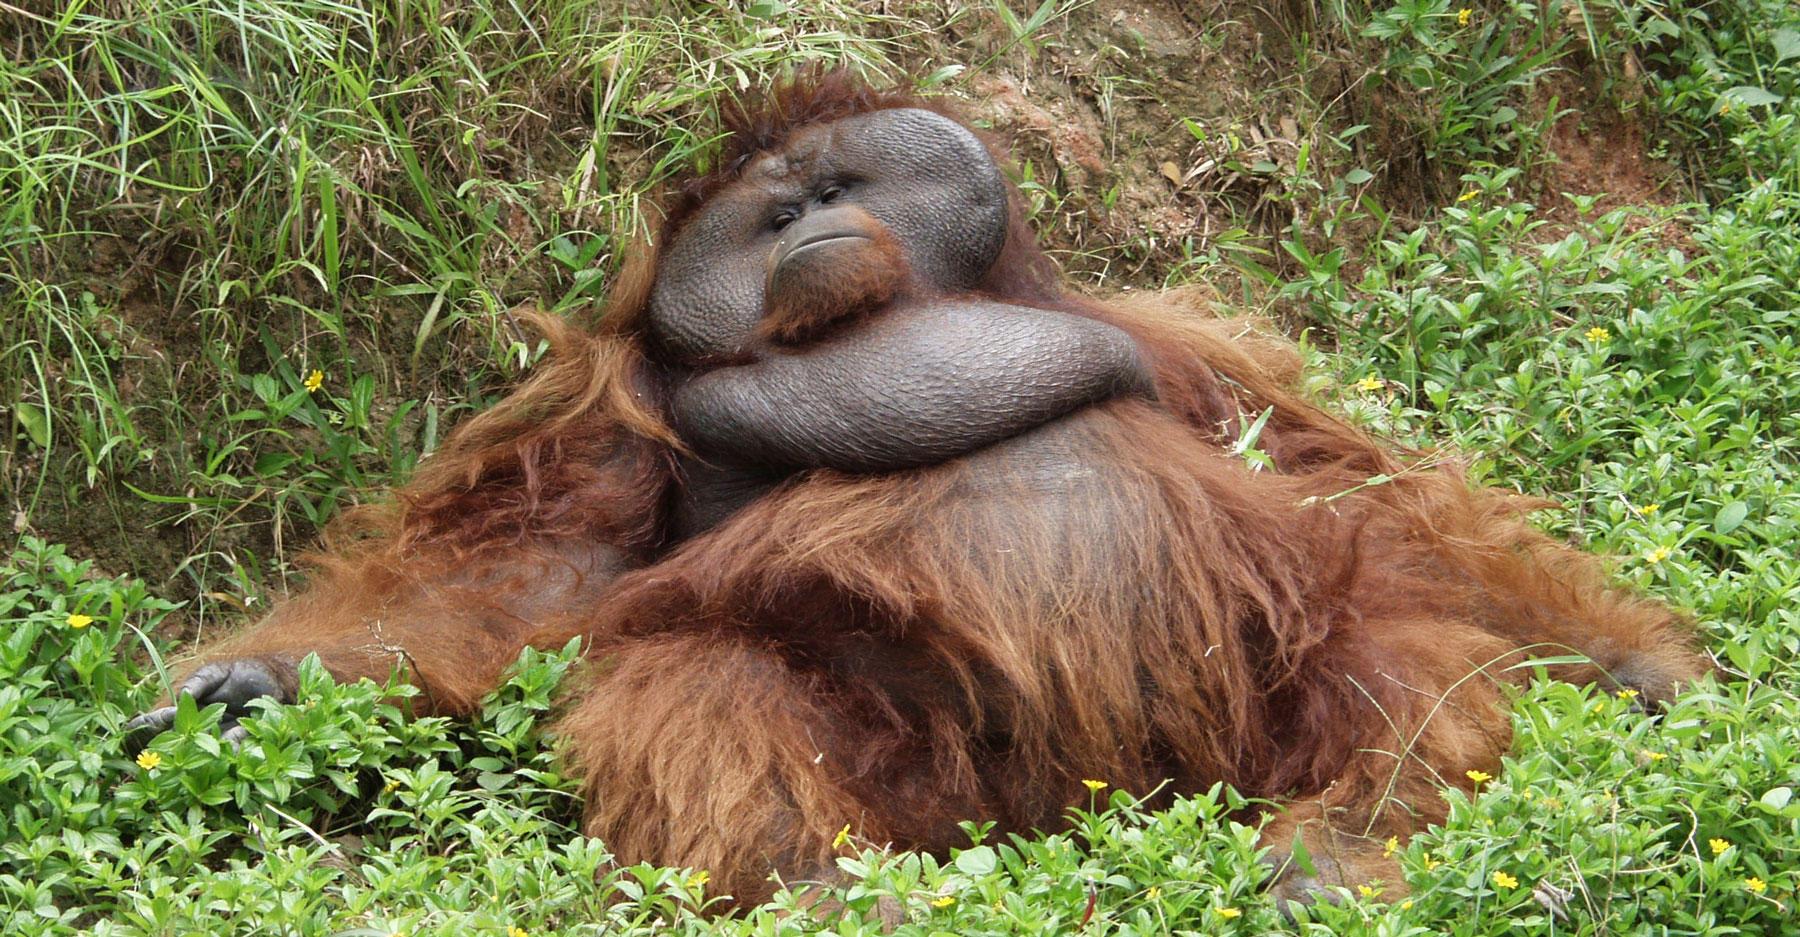 Orangutan hangover